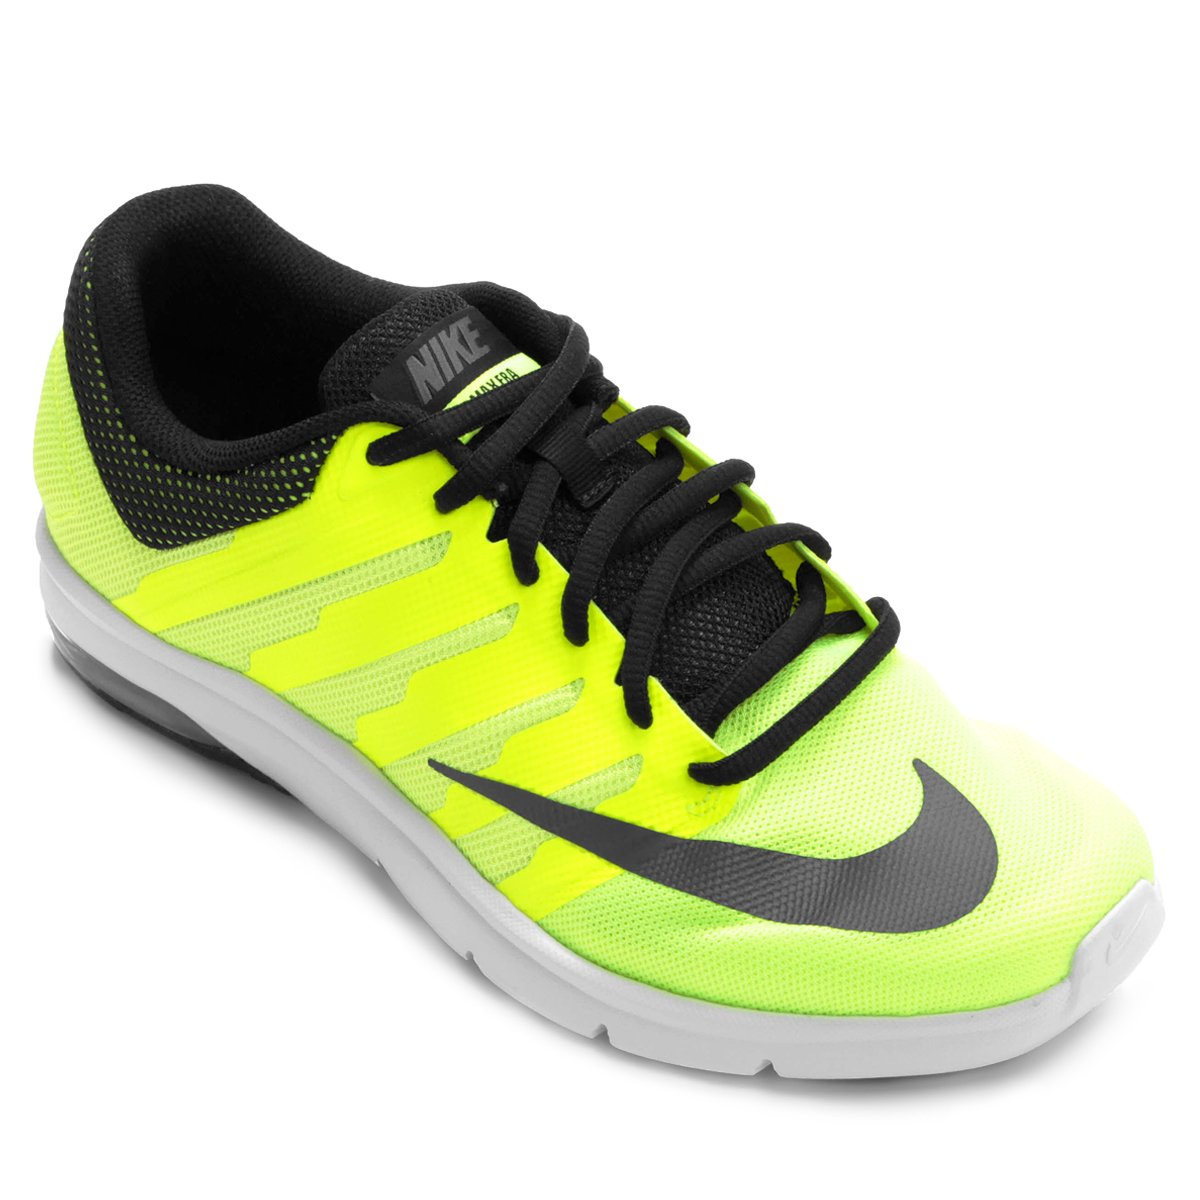 4a9f3625e3d4d Tênis Nike Air Max Era Masculino - Compre Agora